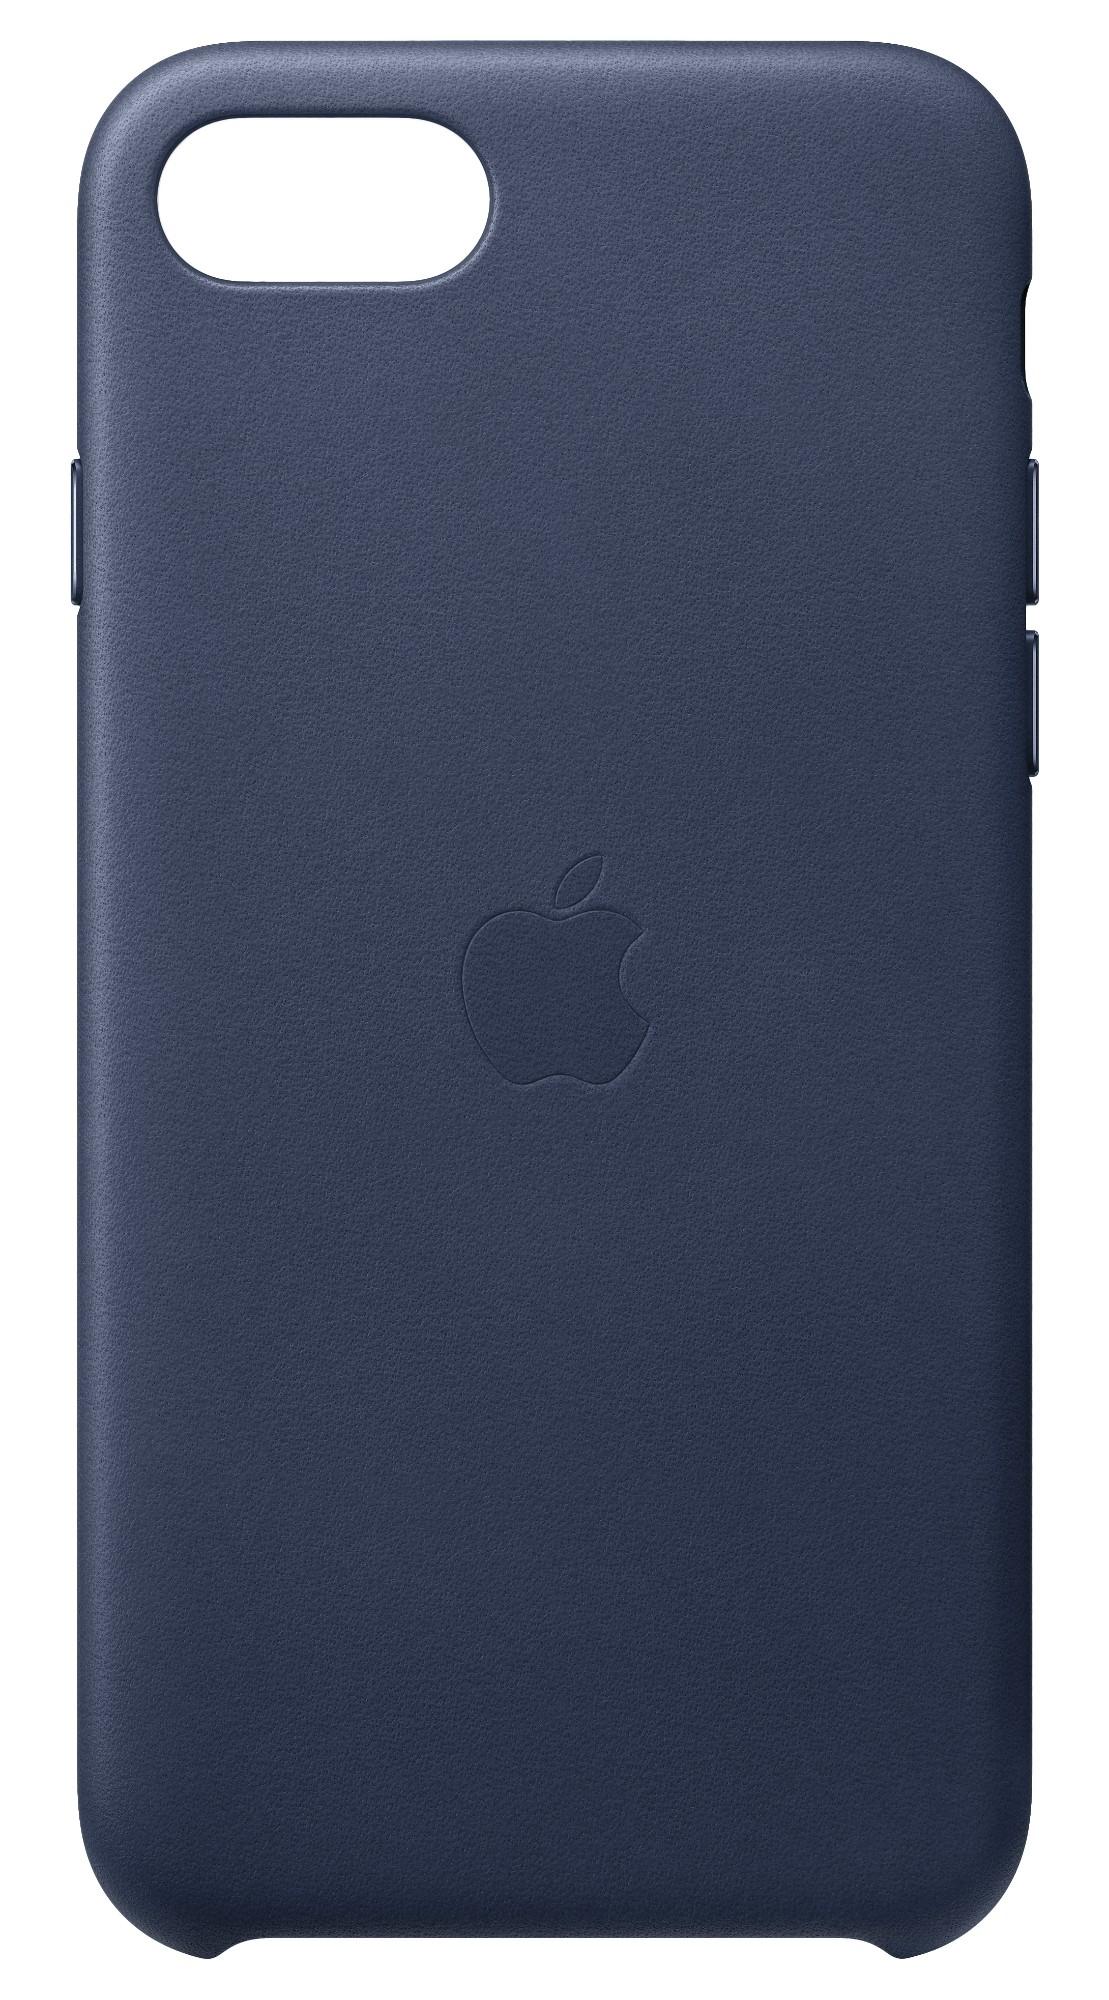 "Apple MXYN2ZM/A?ES funda para teléfono móvil 11,9 cm (4.7"") Azul"